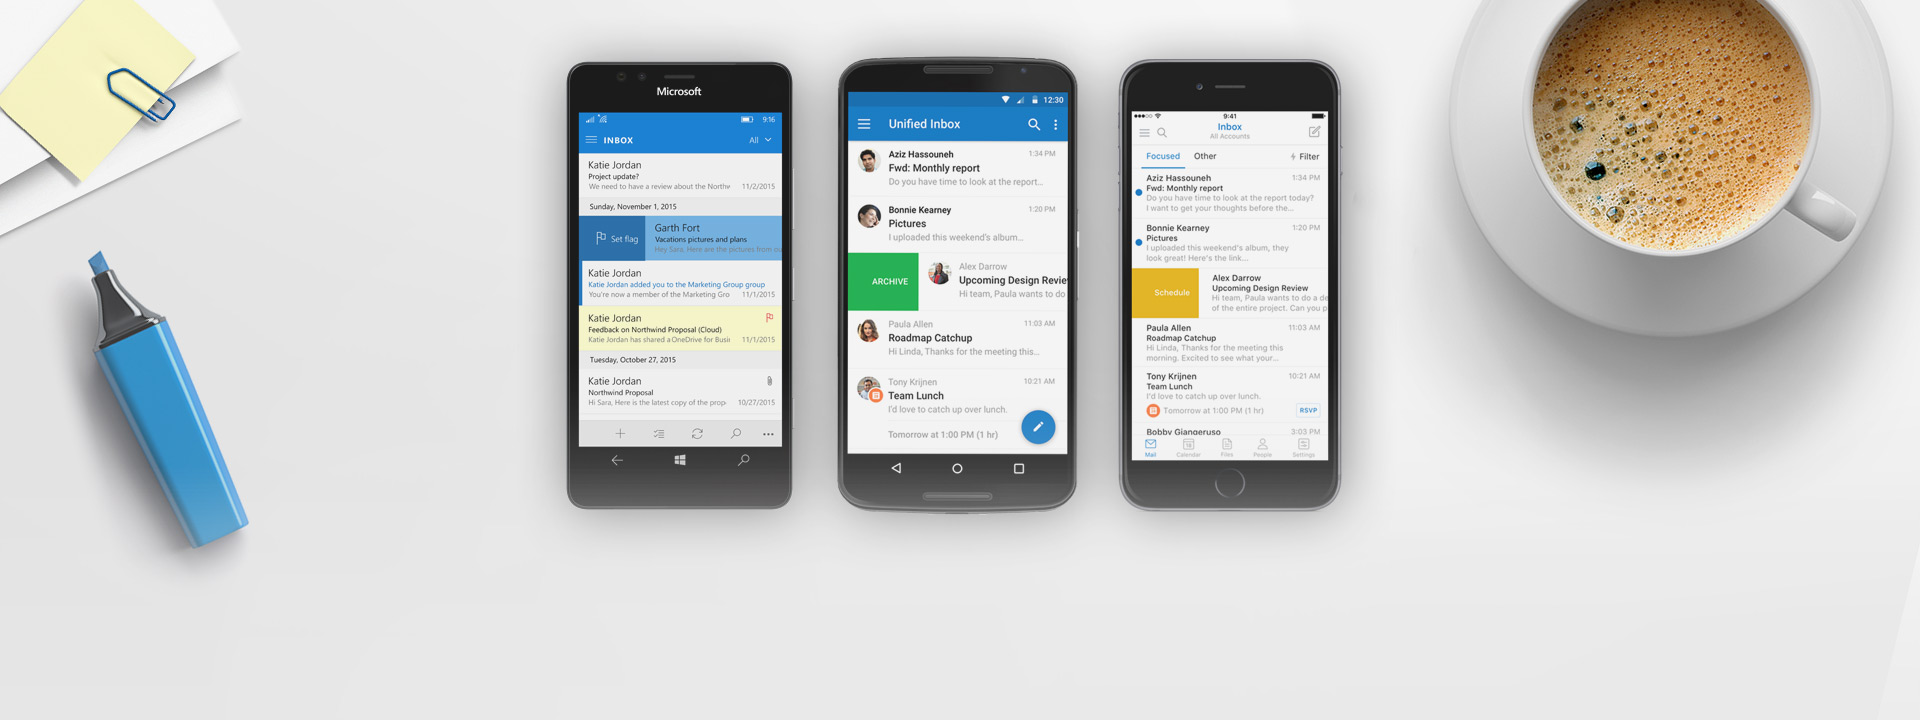 Пользуйтесь приложением Outlook на iPhone и телефонах на платформе Windows Phone и Android